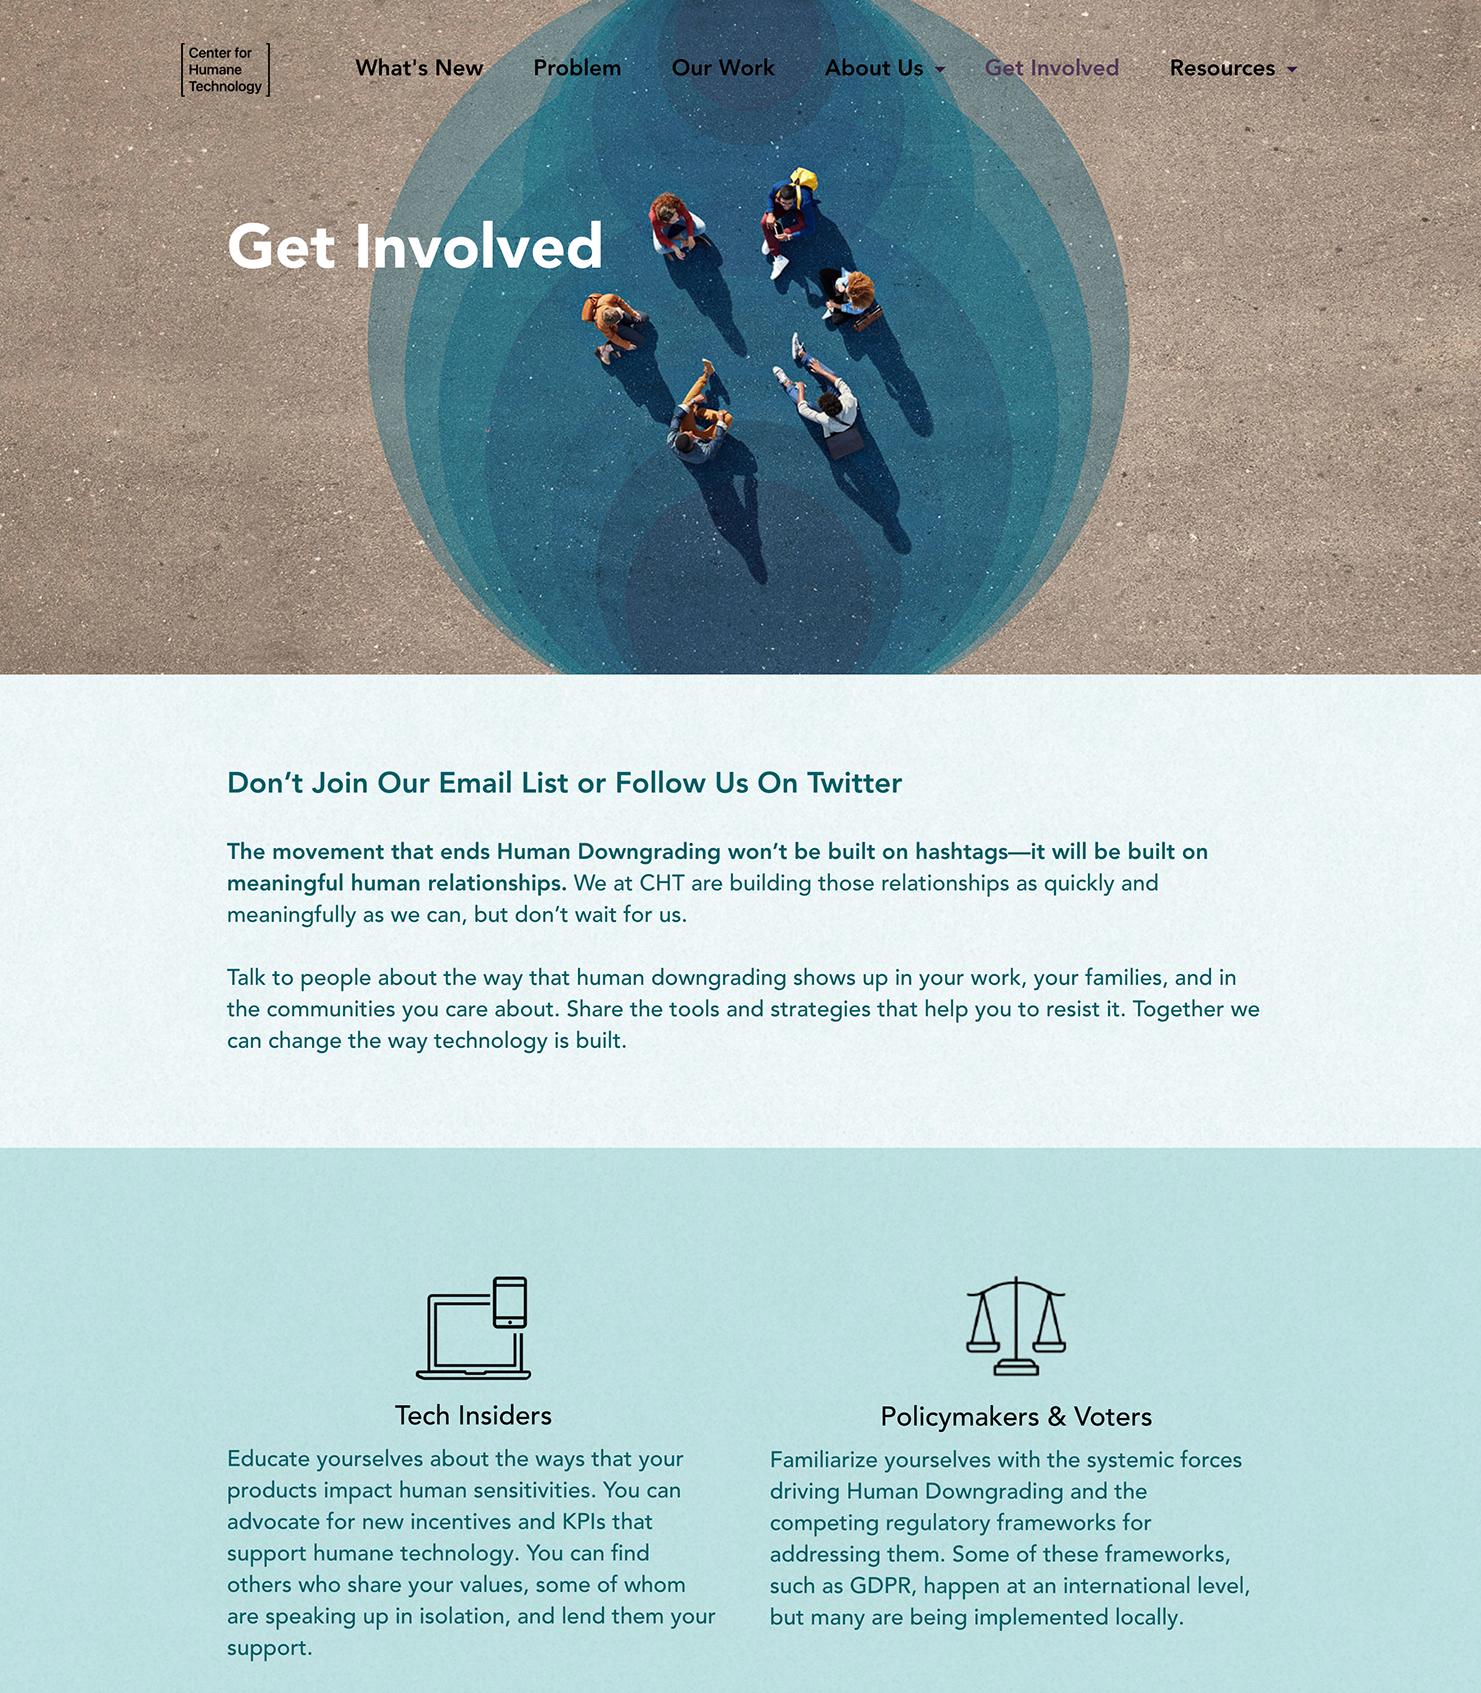 Bay Area Website design for CHT - Center for Humane Technology